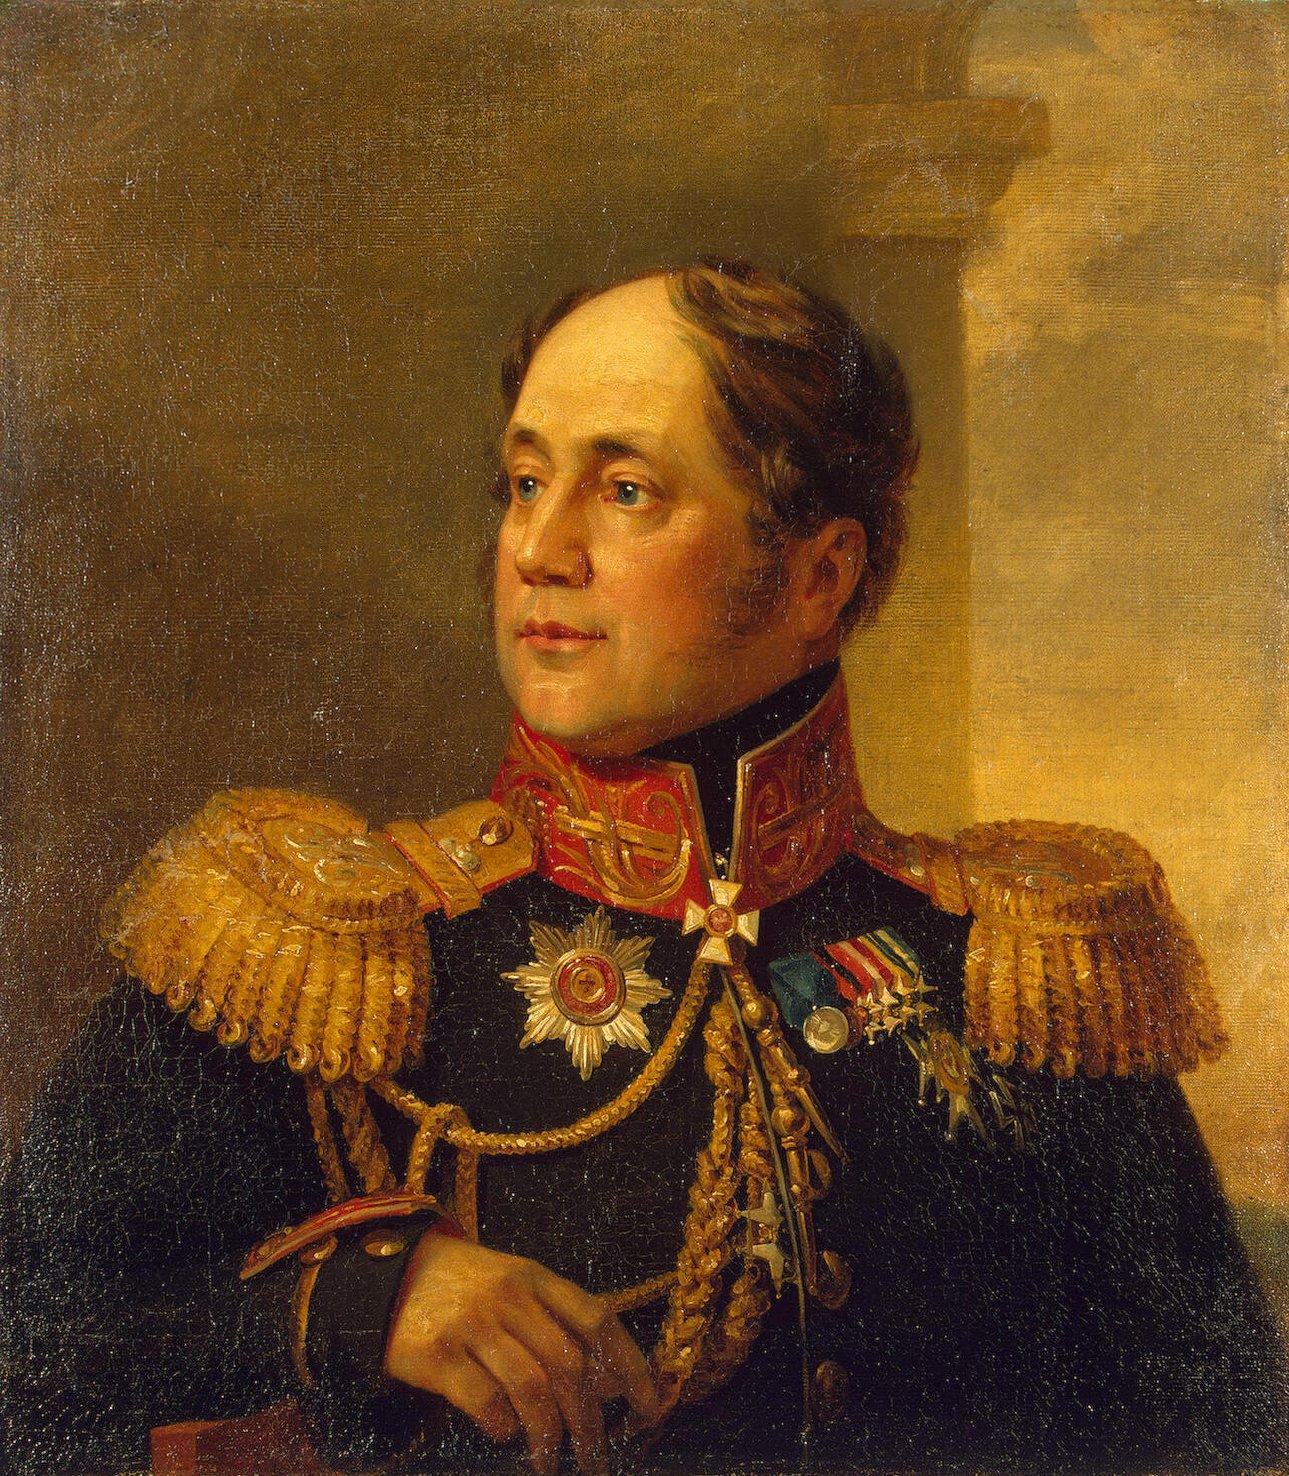 Сипягин, Николай Мартемьянович